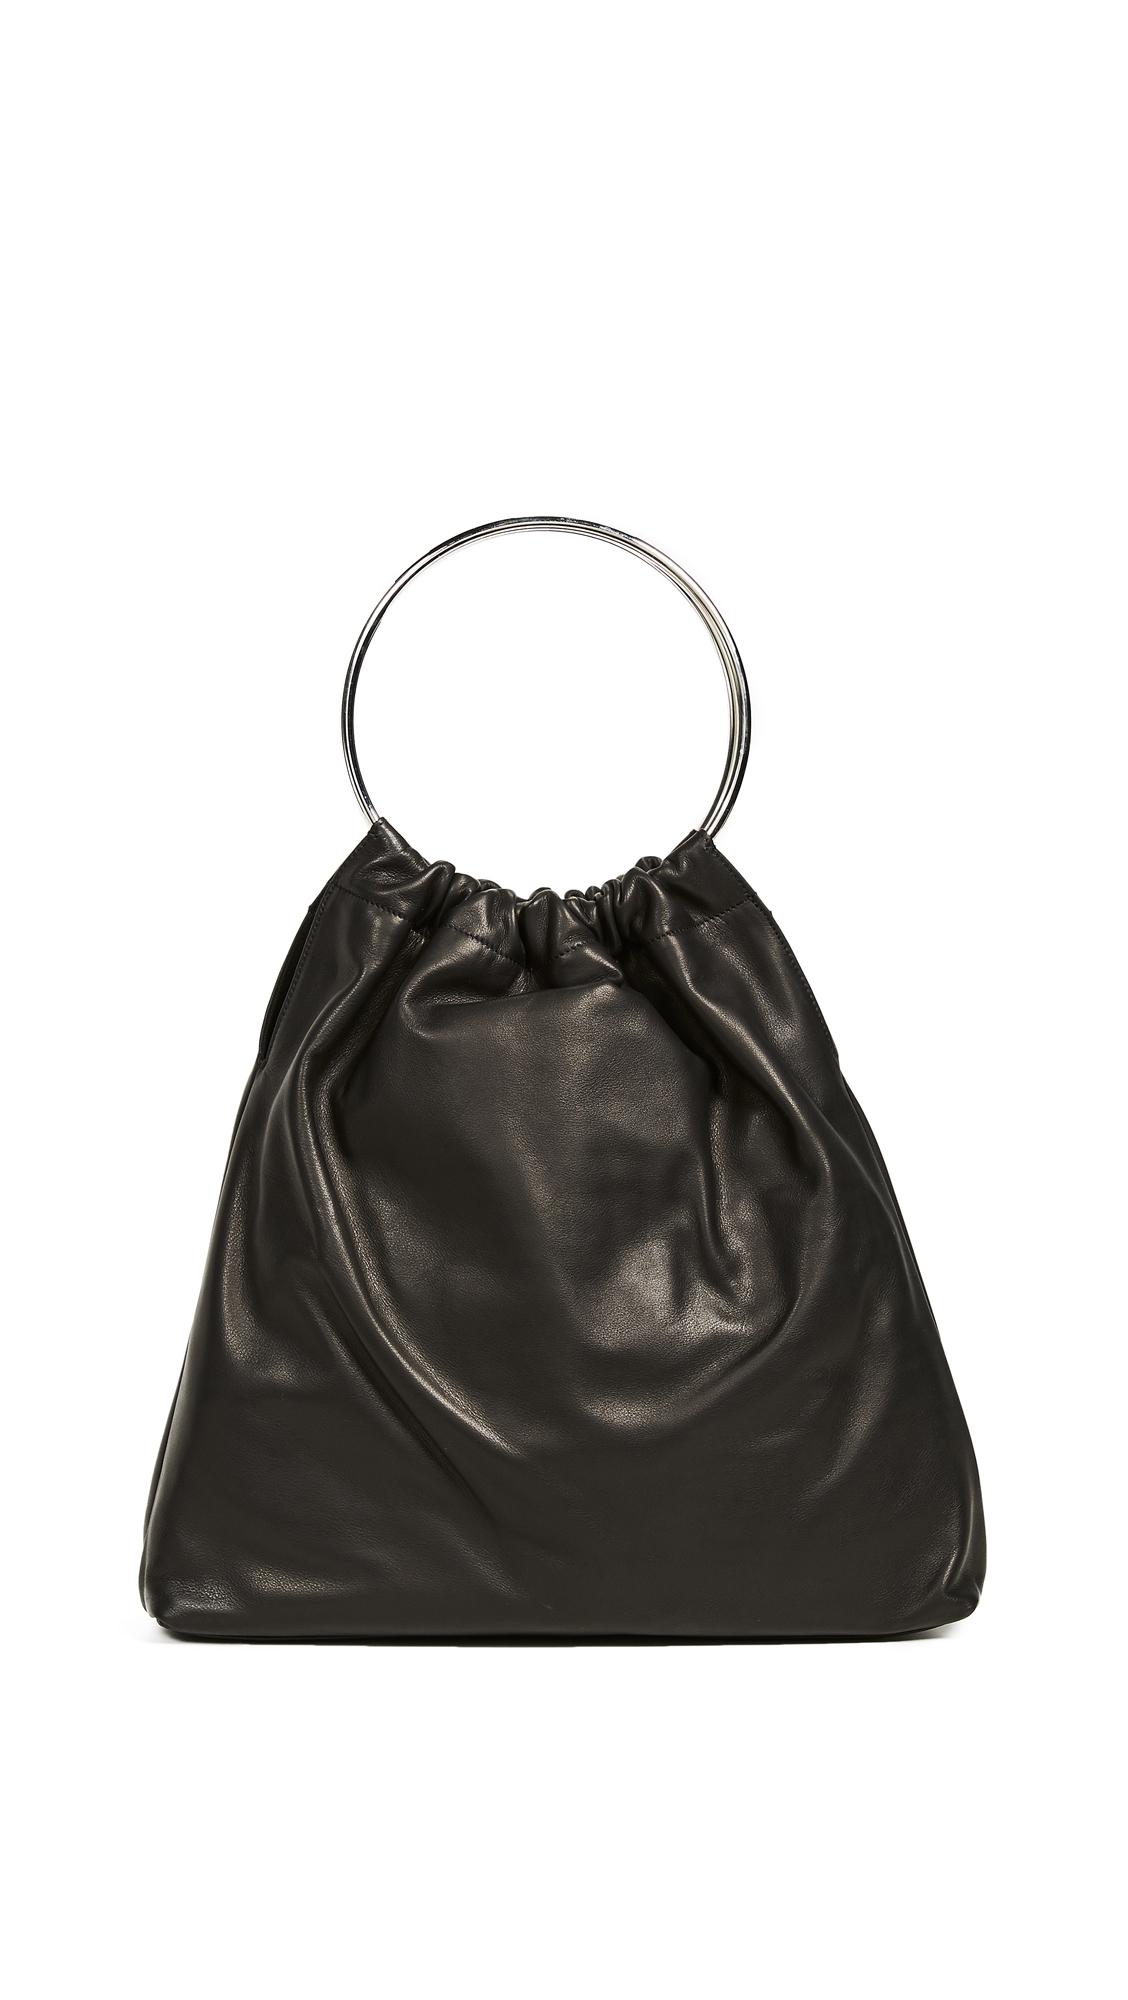 LITTLE LIFFNER Ring Purse in Black